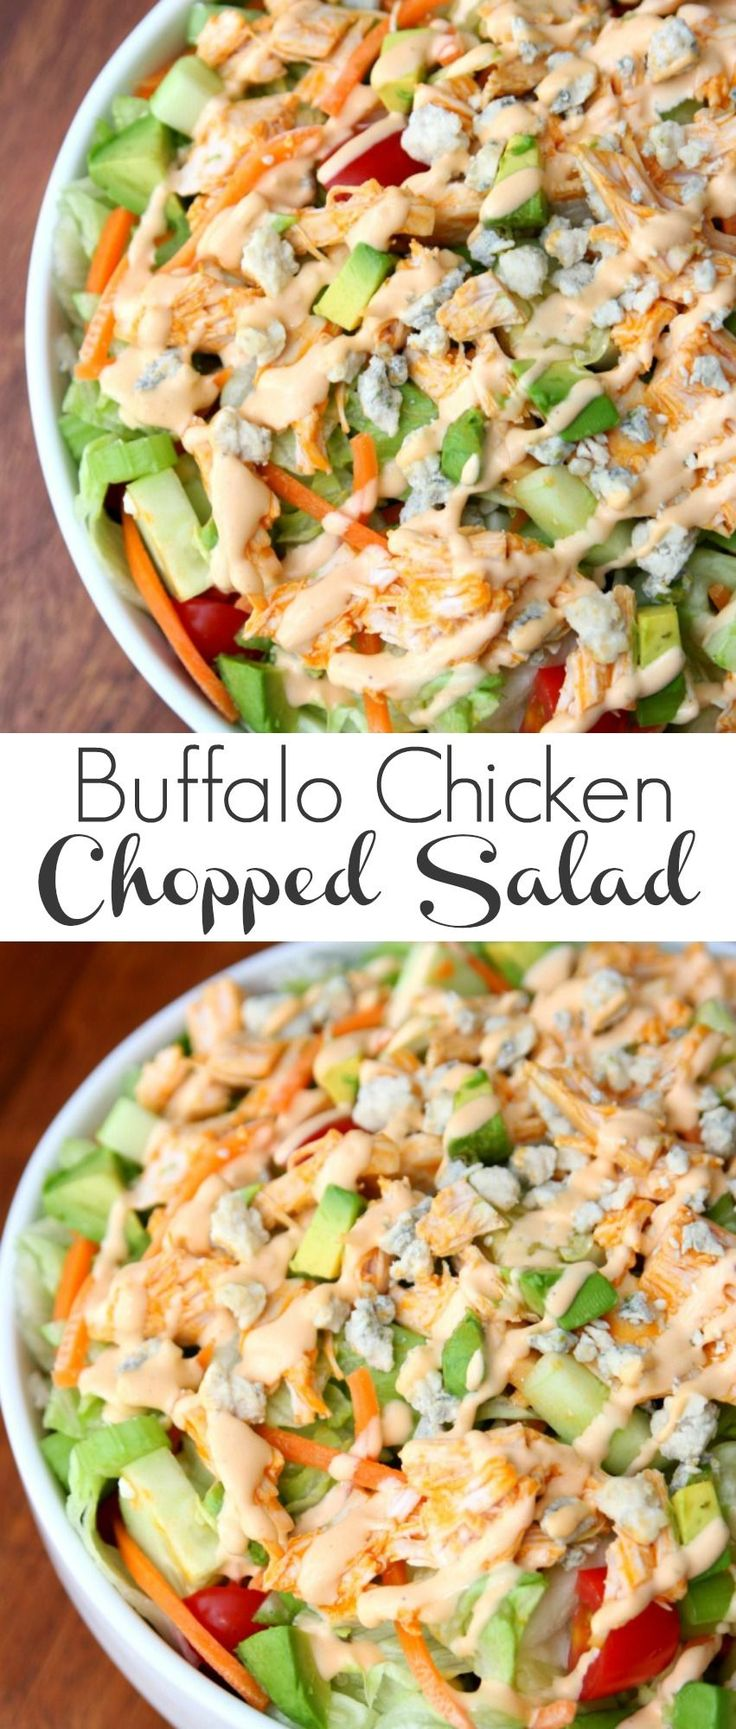 Buffalo Chicken Chopped Salad - Happy-Go-Lucky #TimelessPizza AD